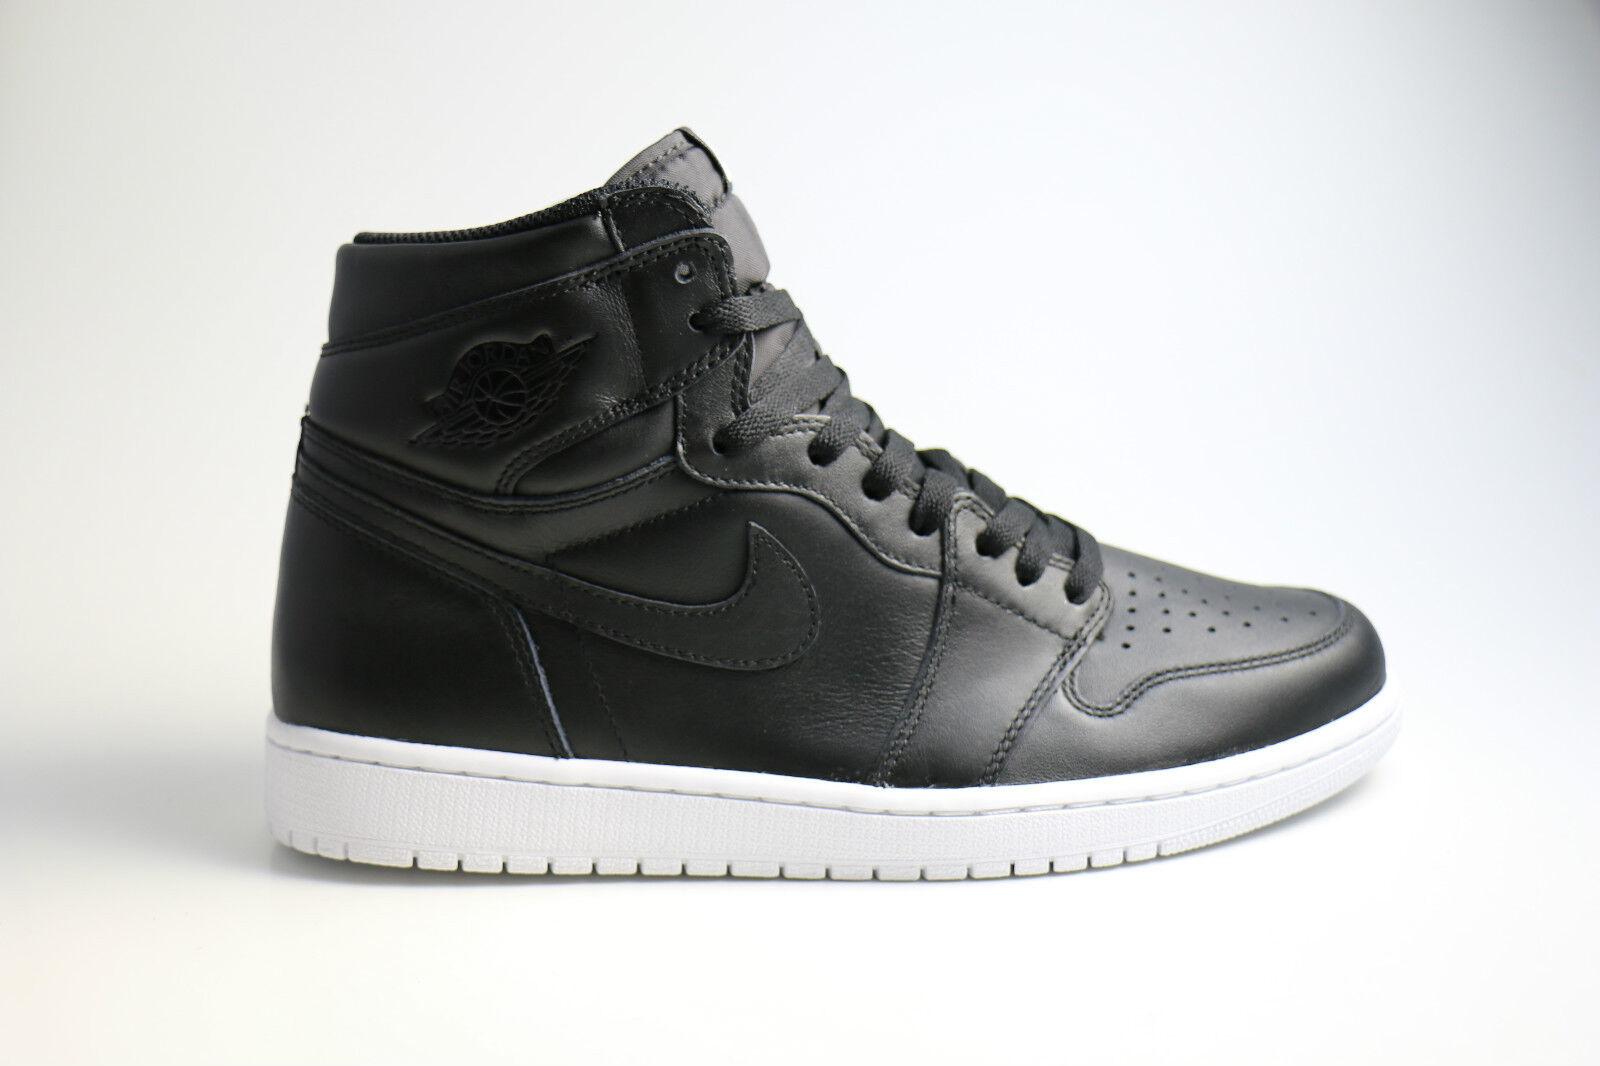 Nike Air Jordan 1 OG Cyber Monday schwarz 43 44 44,5 45 9,5 10 10,5 11 555088 006